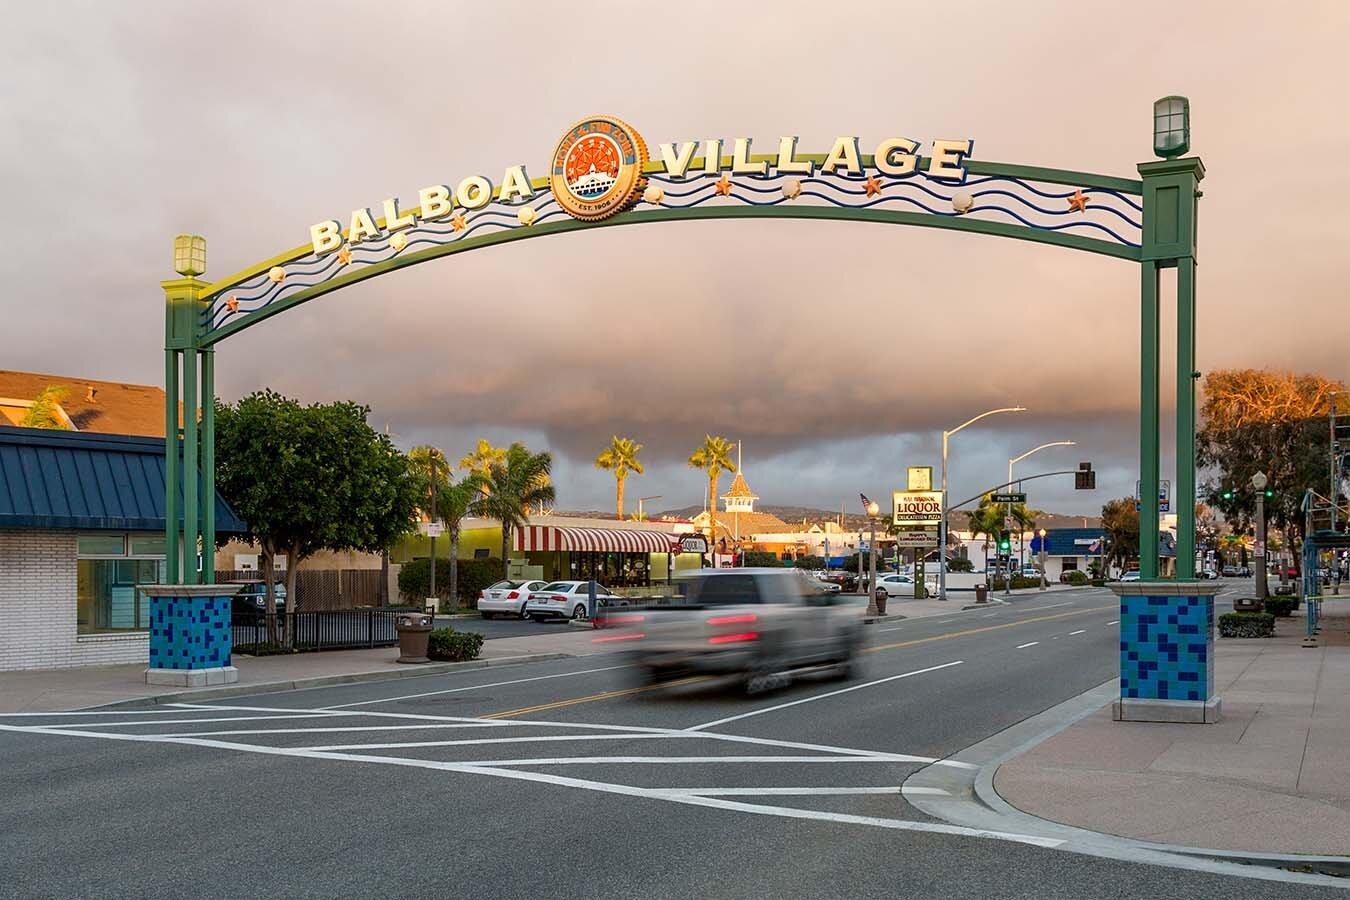 Balboa Village arch.jpg